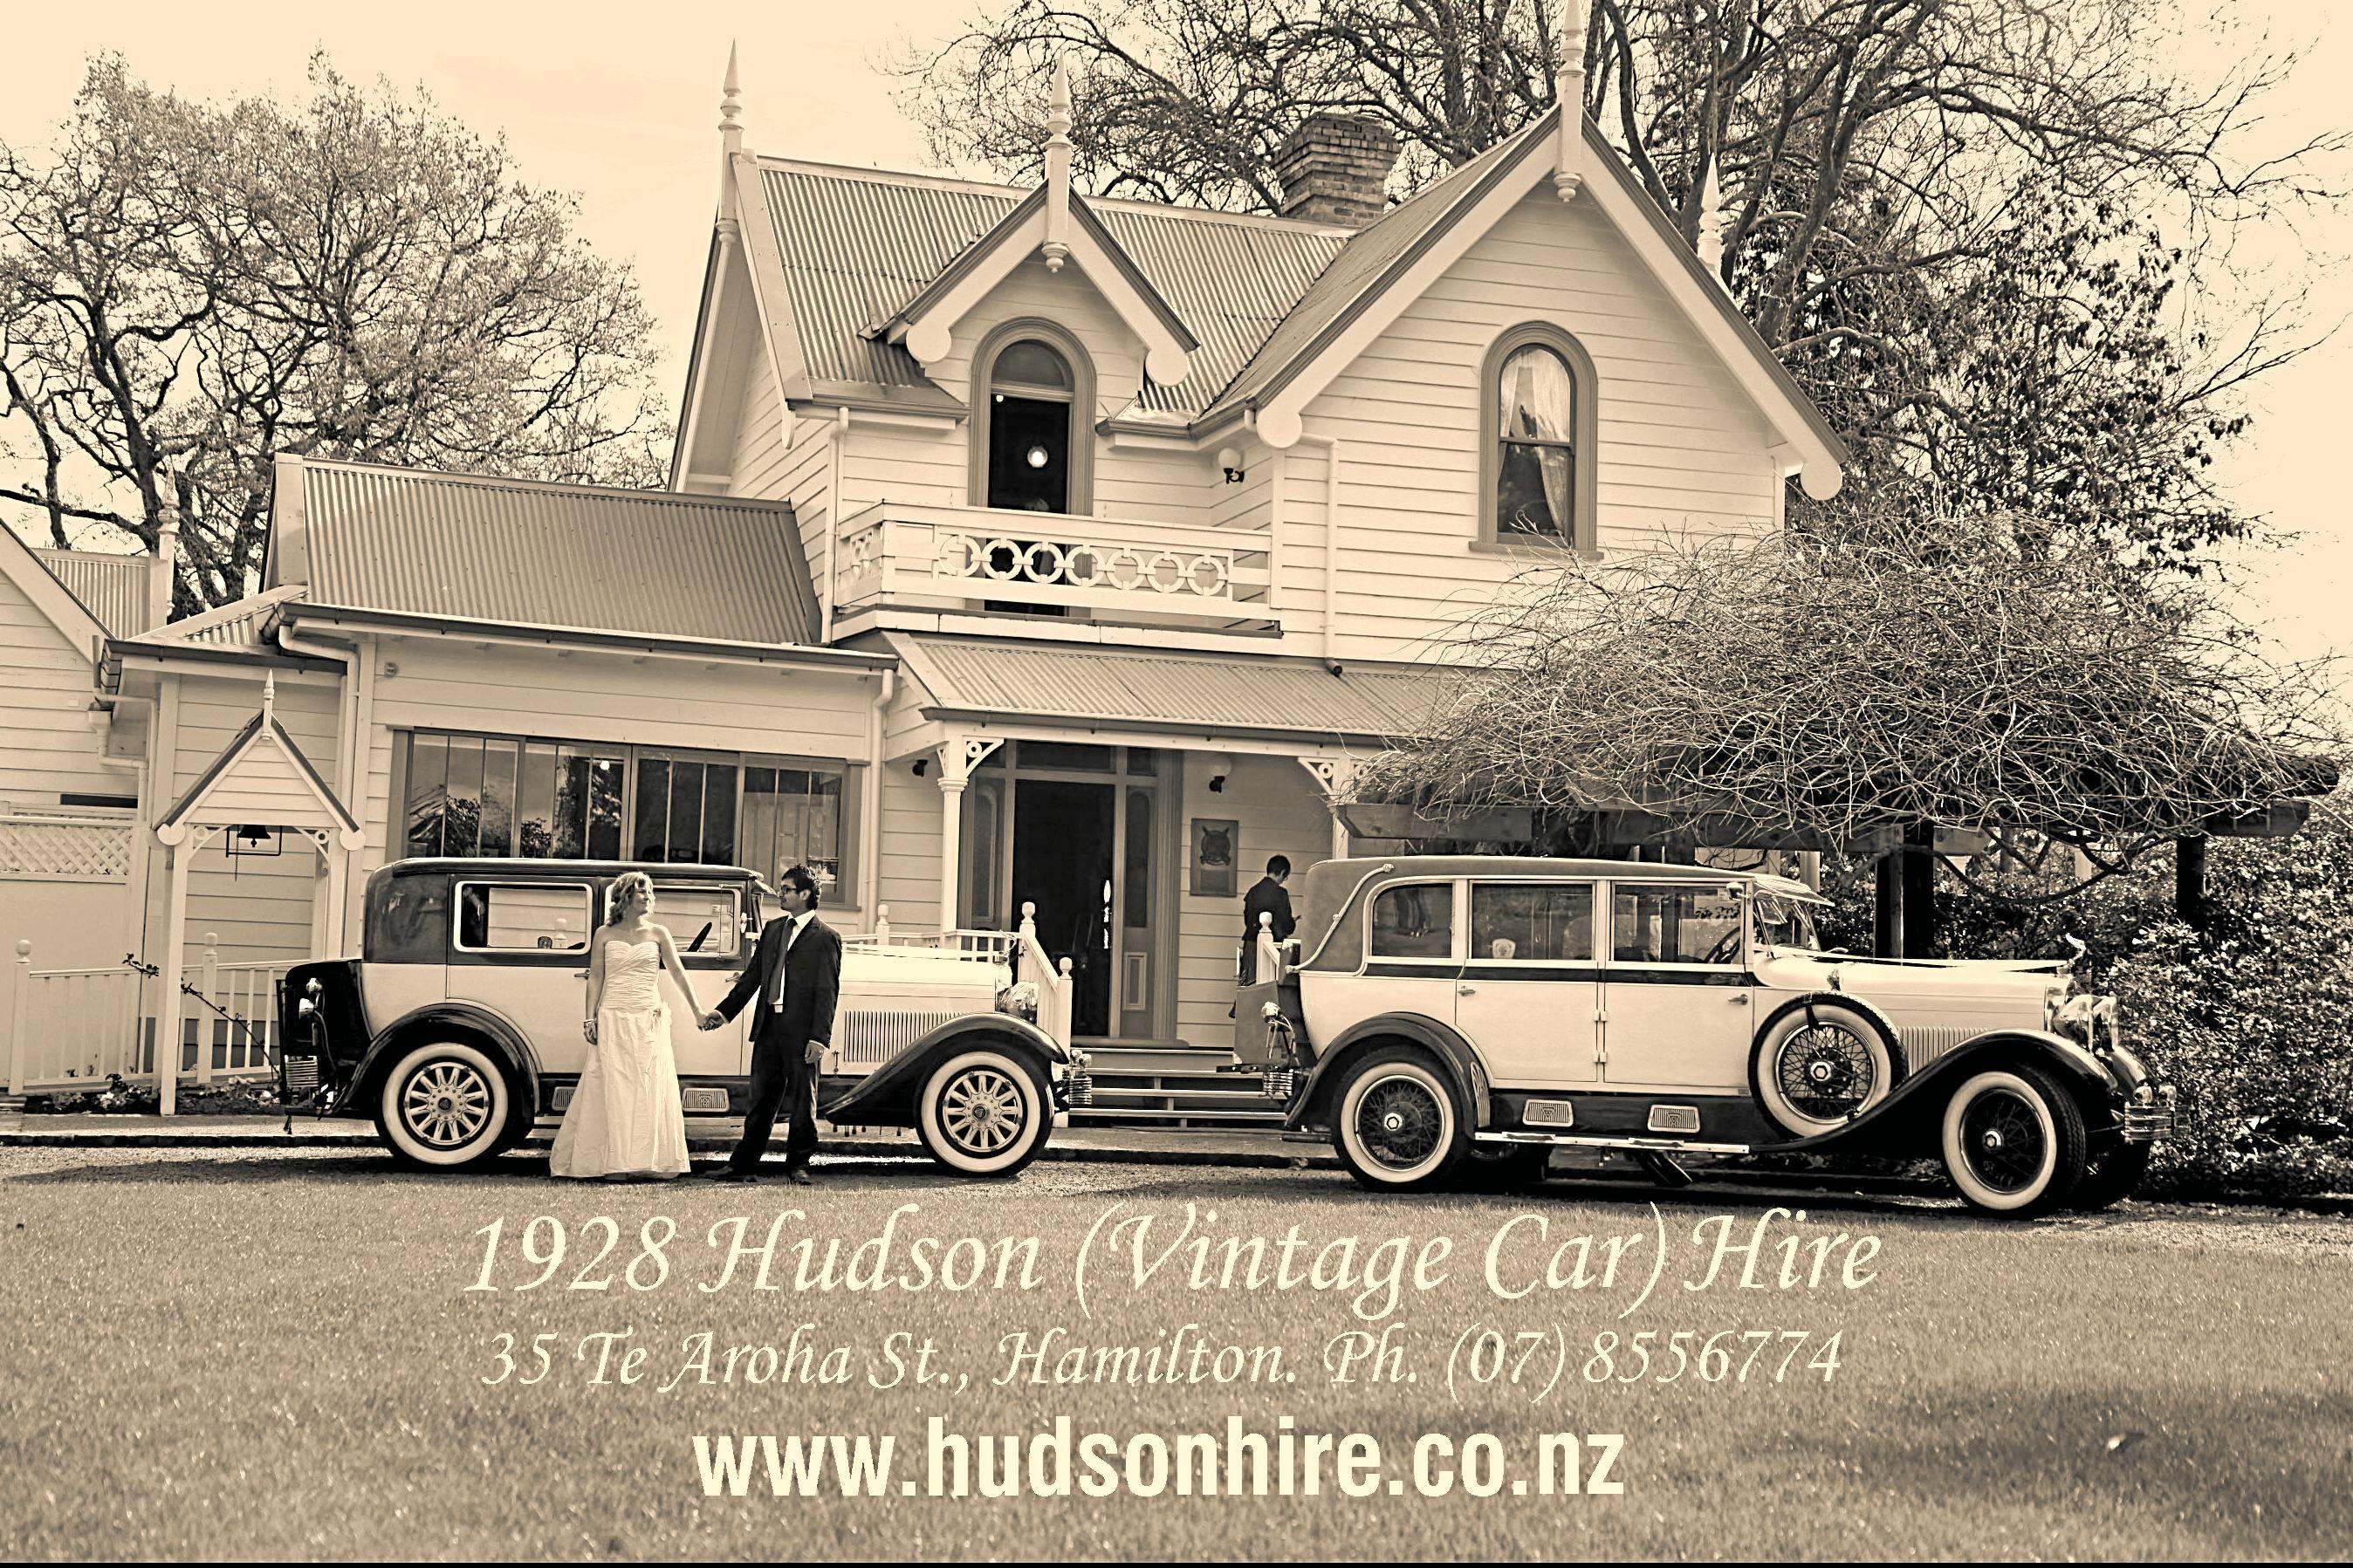 1928 Hudson (Vintage car) Hire promo pic